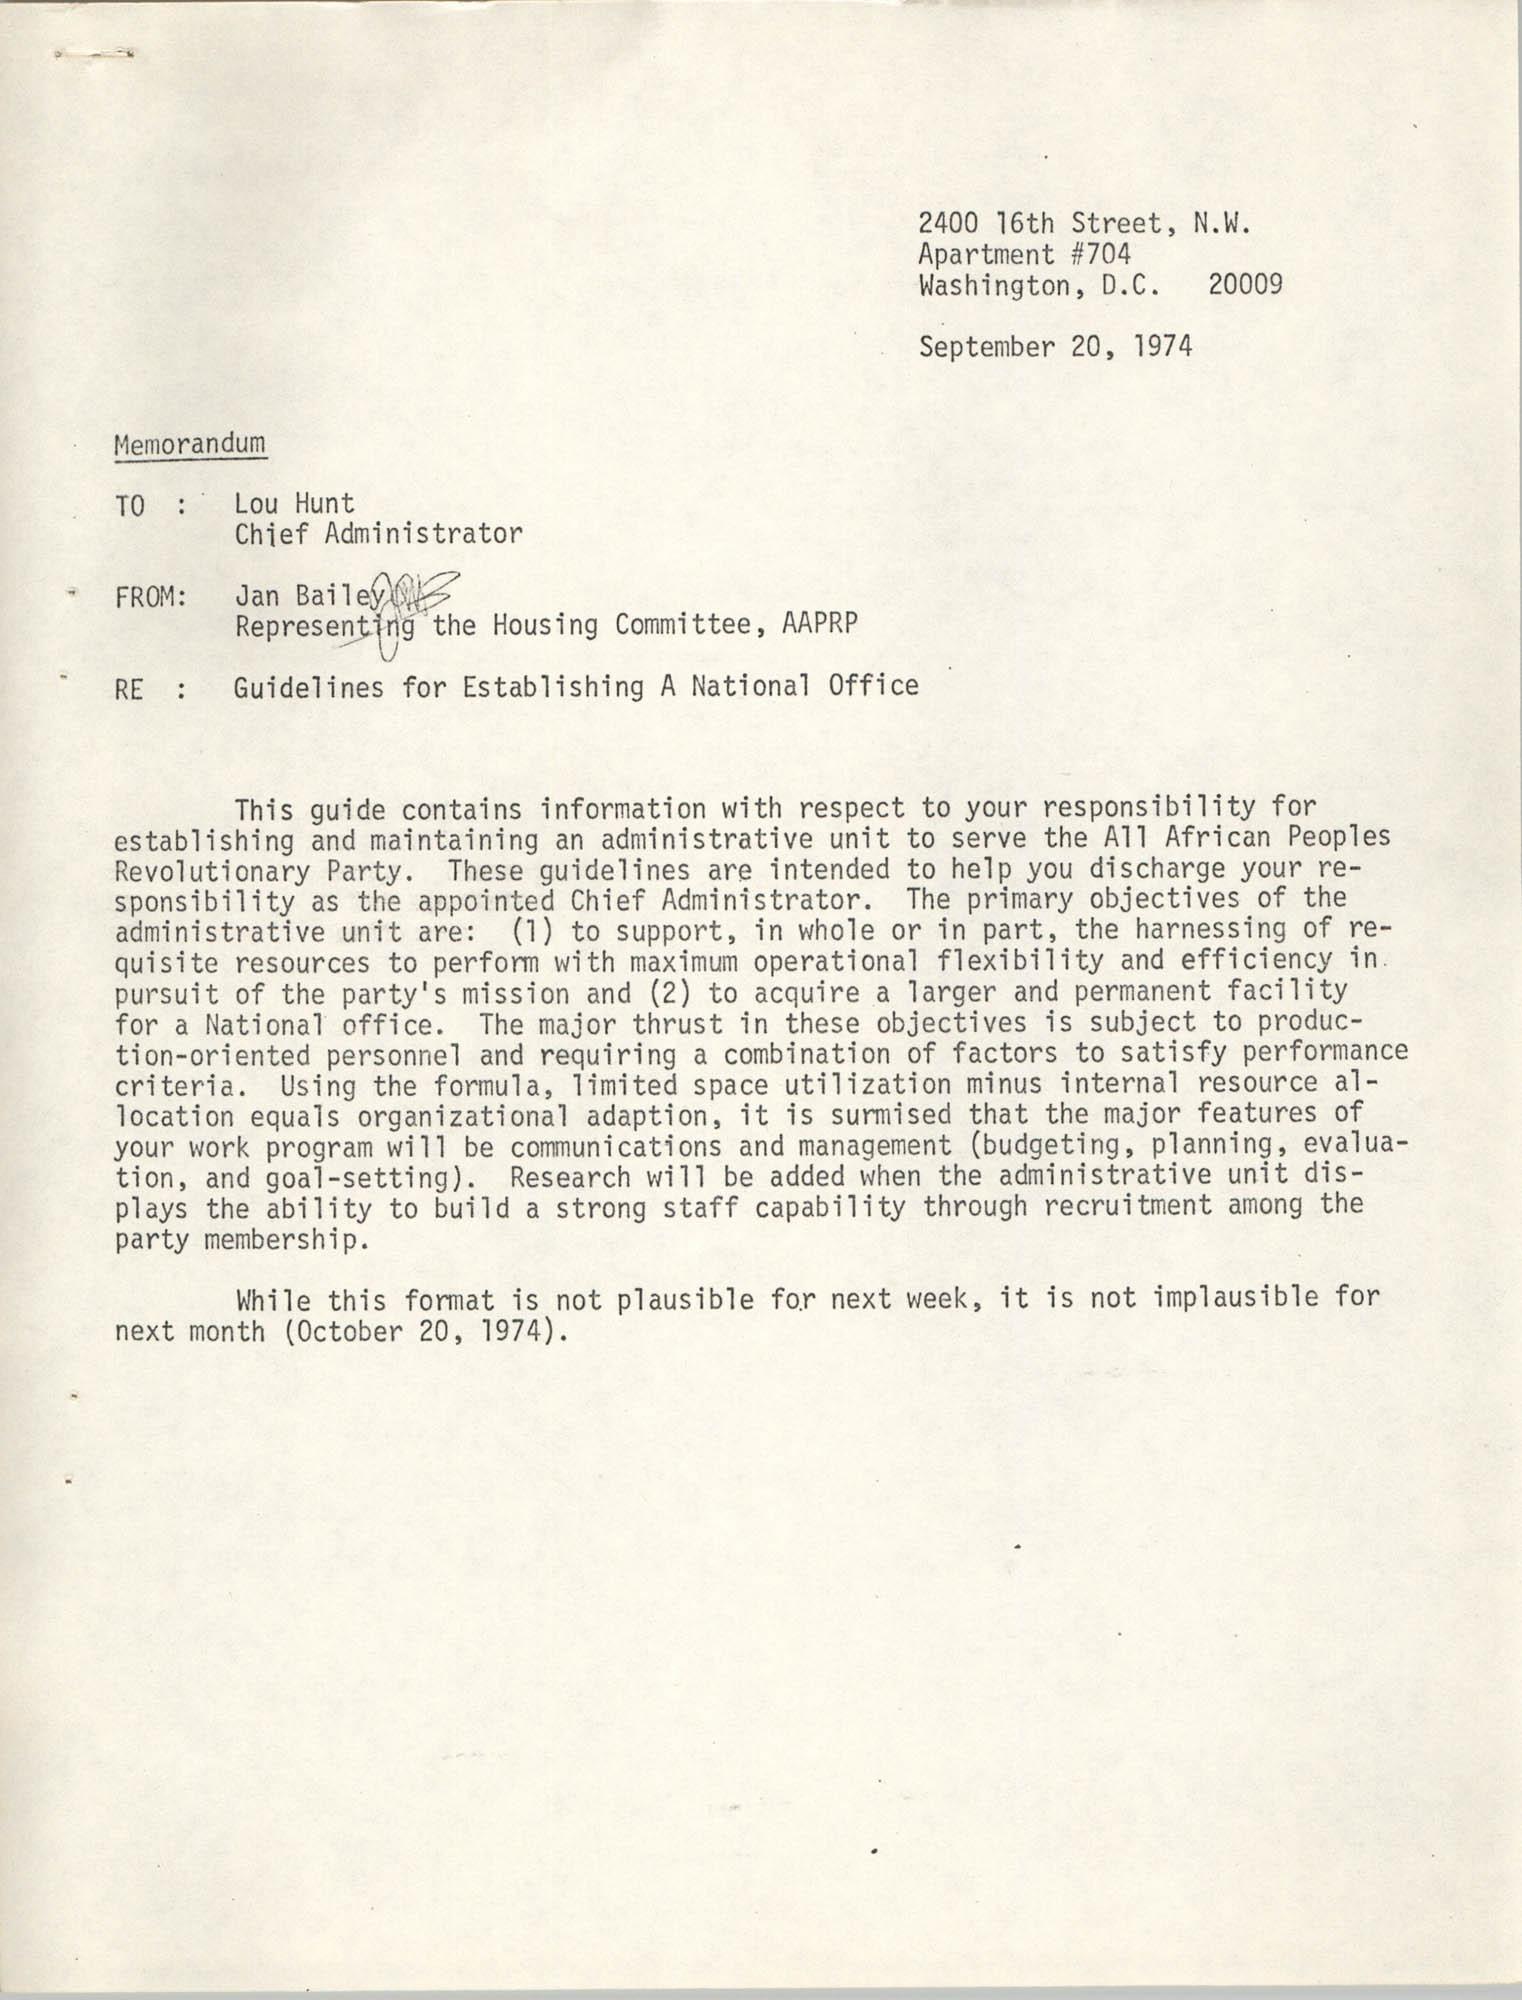 Memorandum from Jan Bailey to Lou Hunt, September 20, 1974